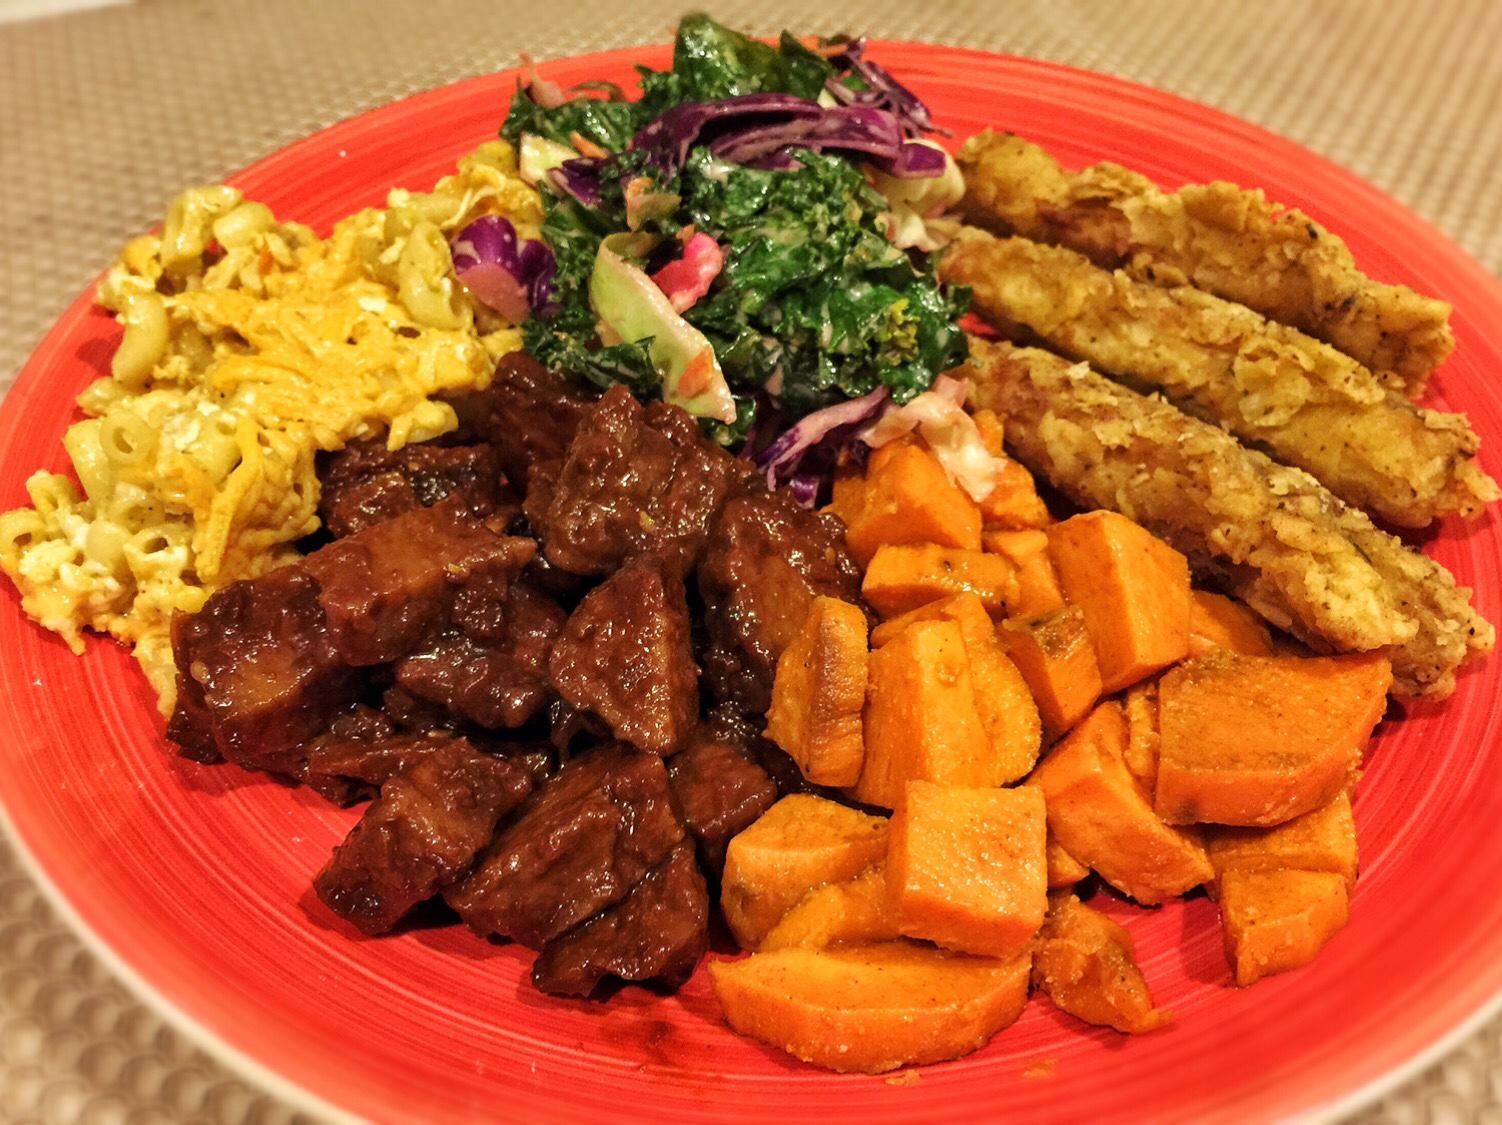 BBQ Seitan, Yams, Fried Chick'n, Kale Slaw and Mac & Cheese